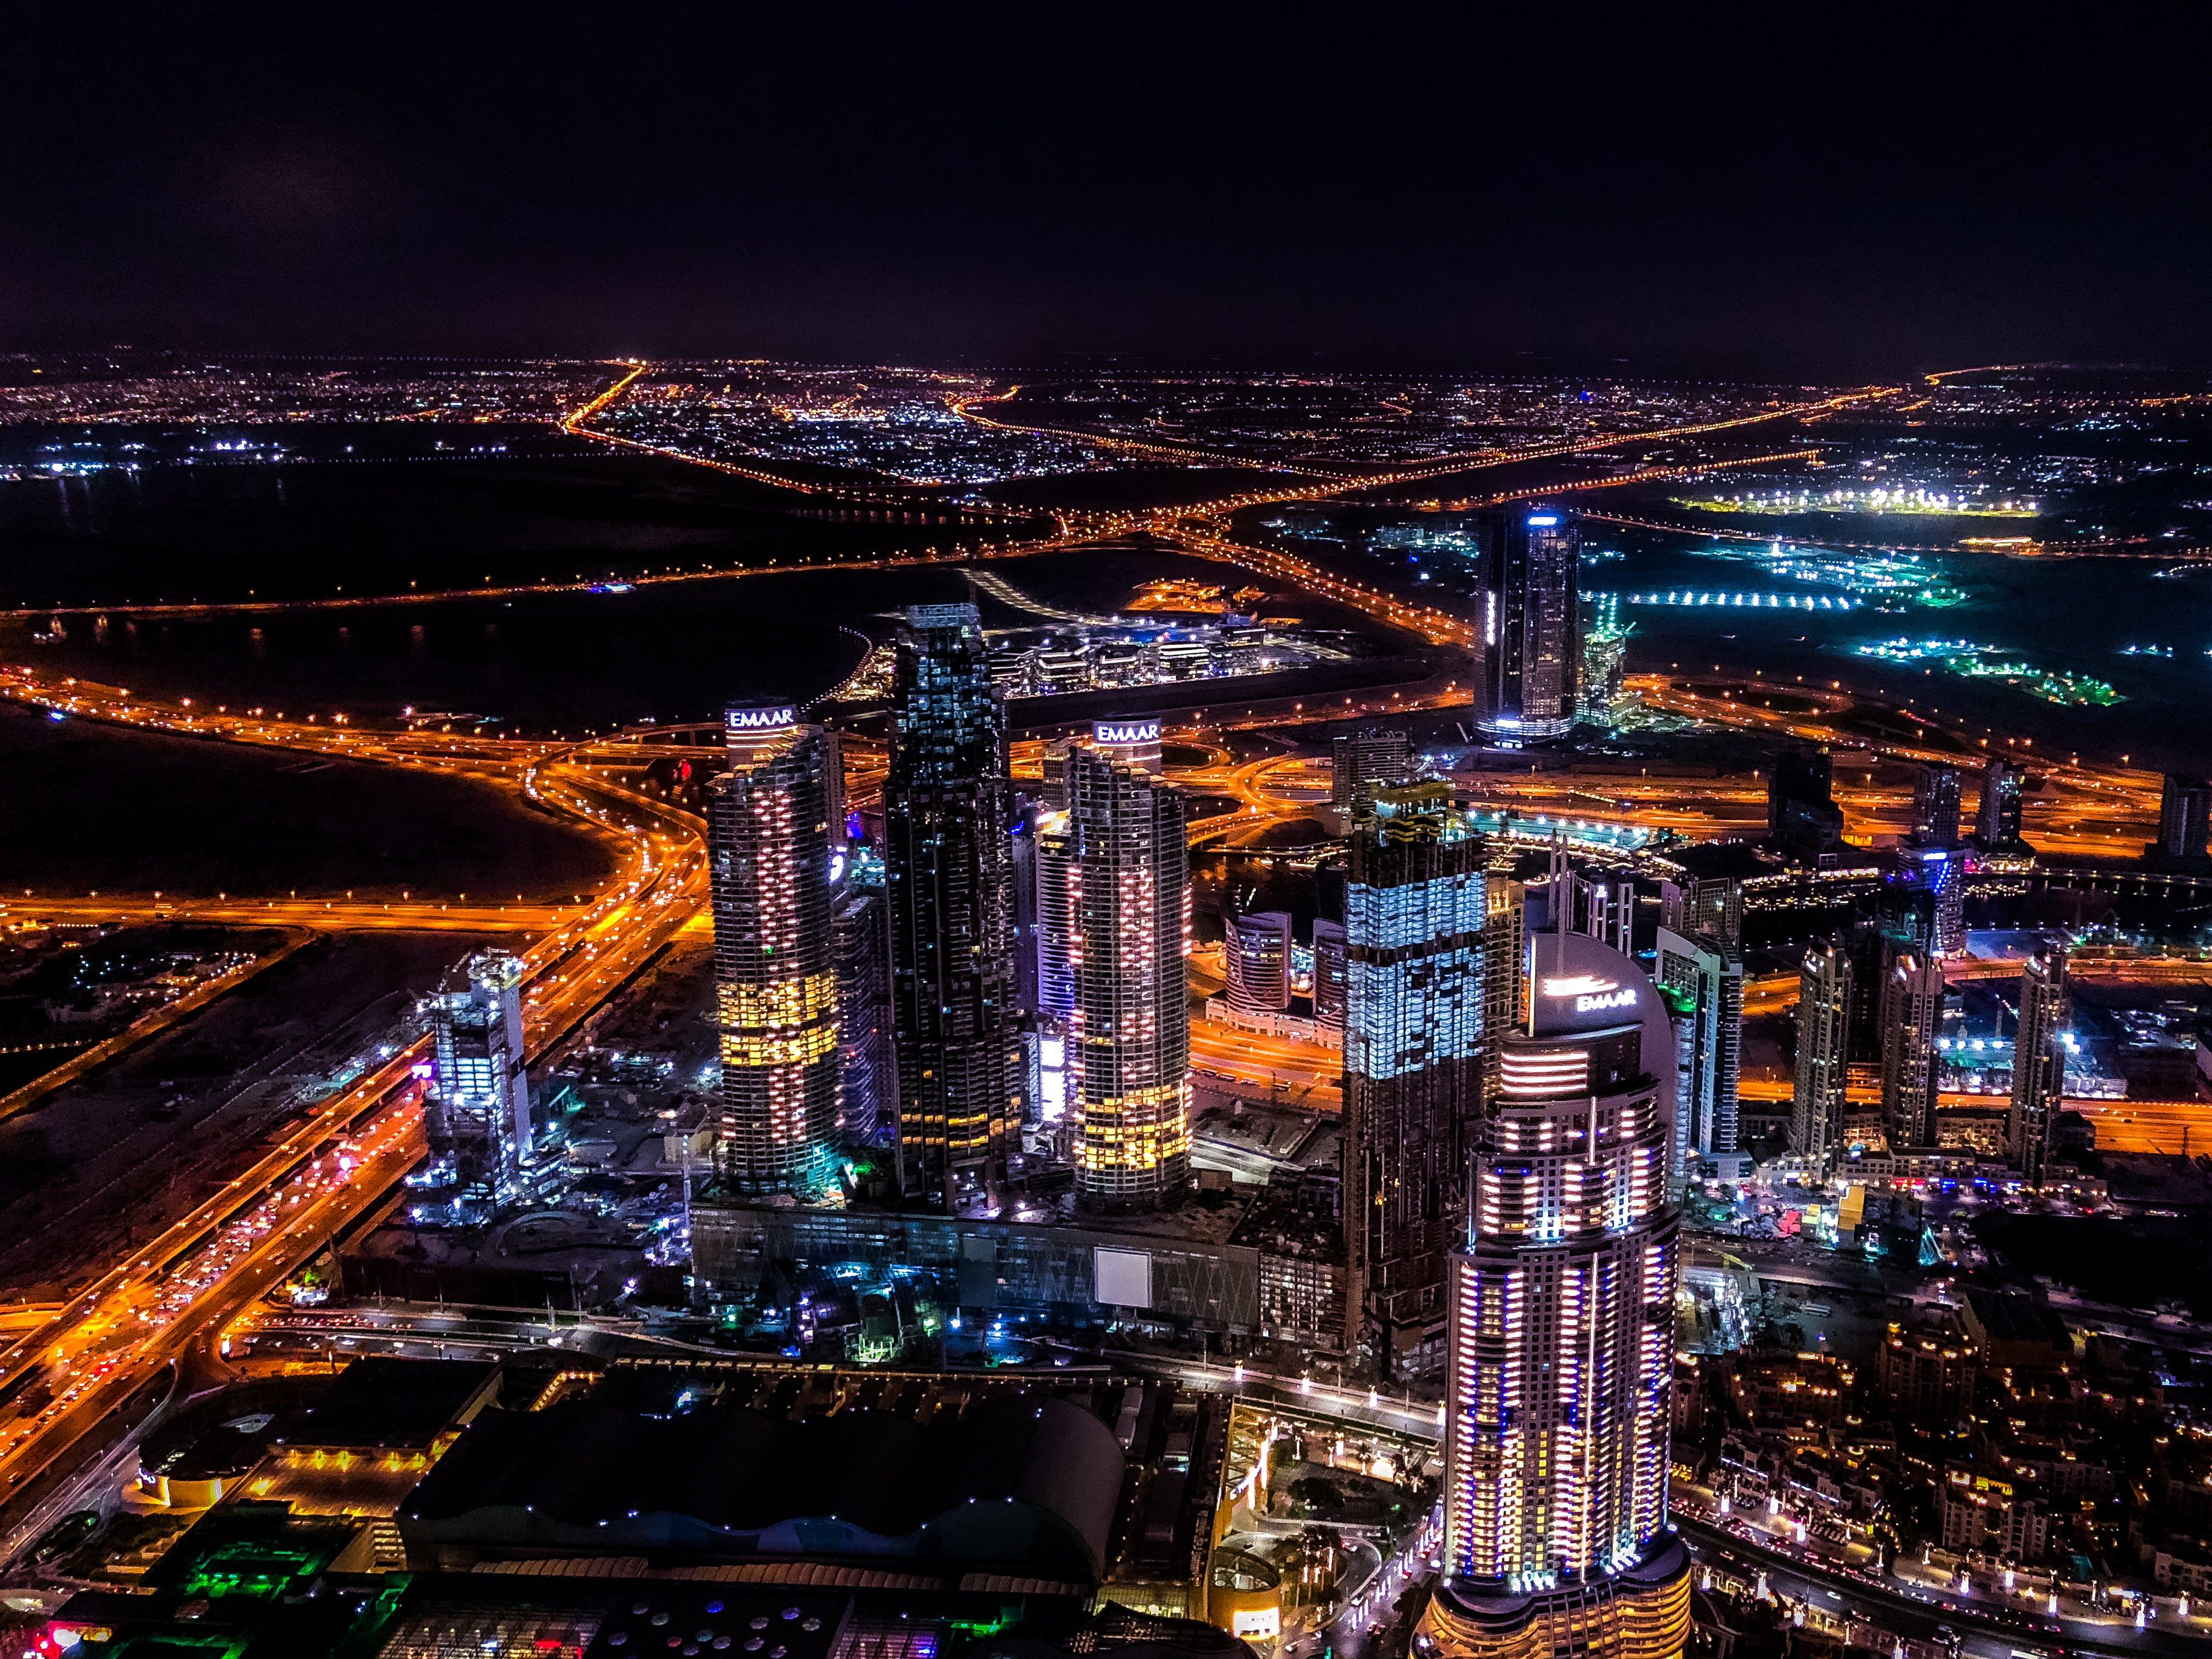 New York City Buildings at Night